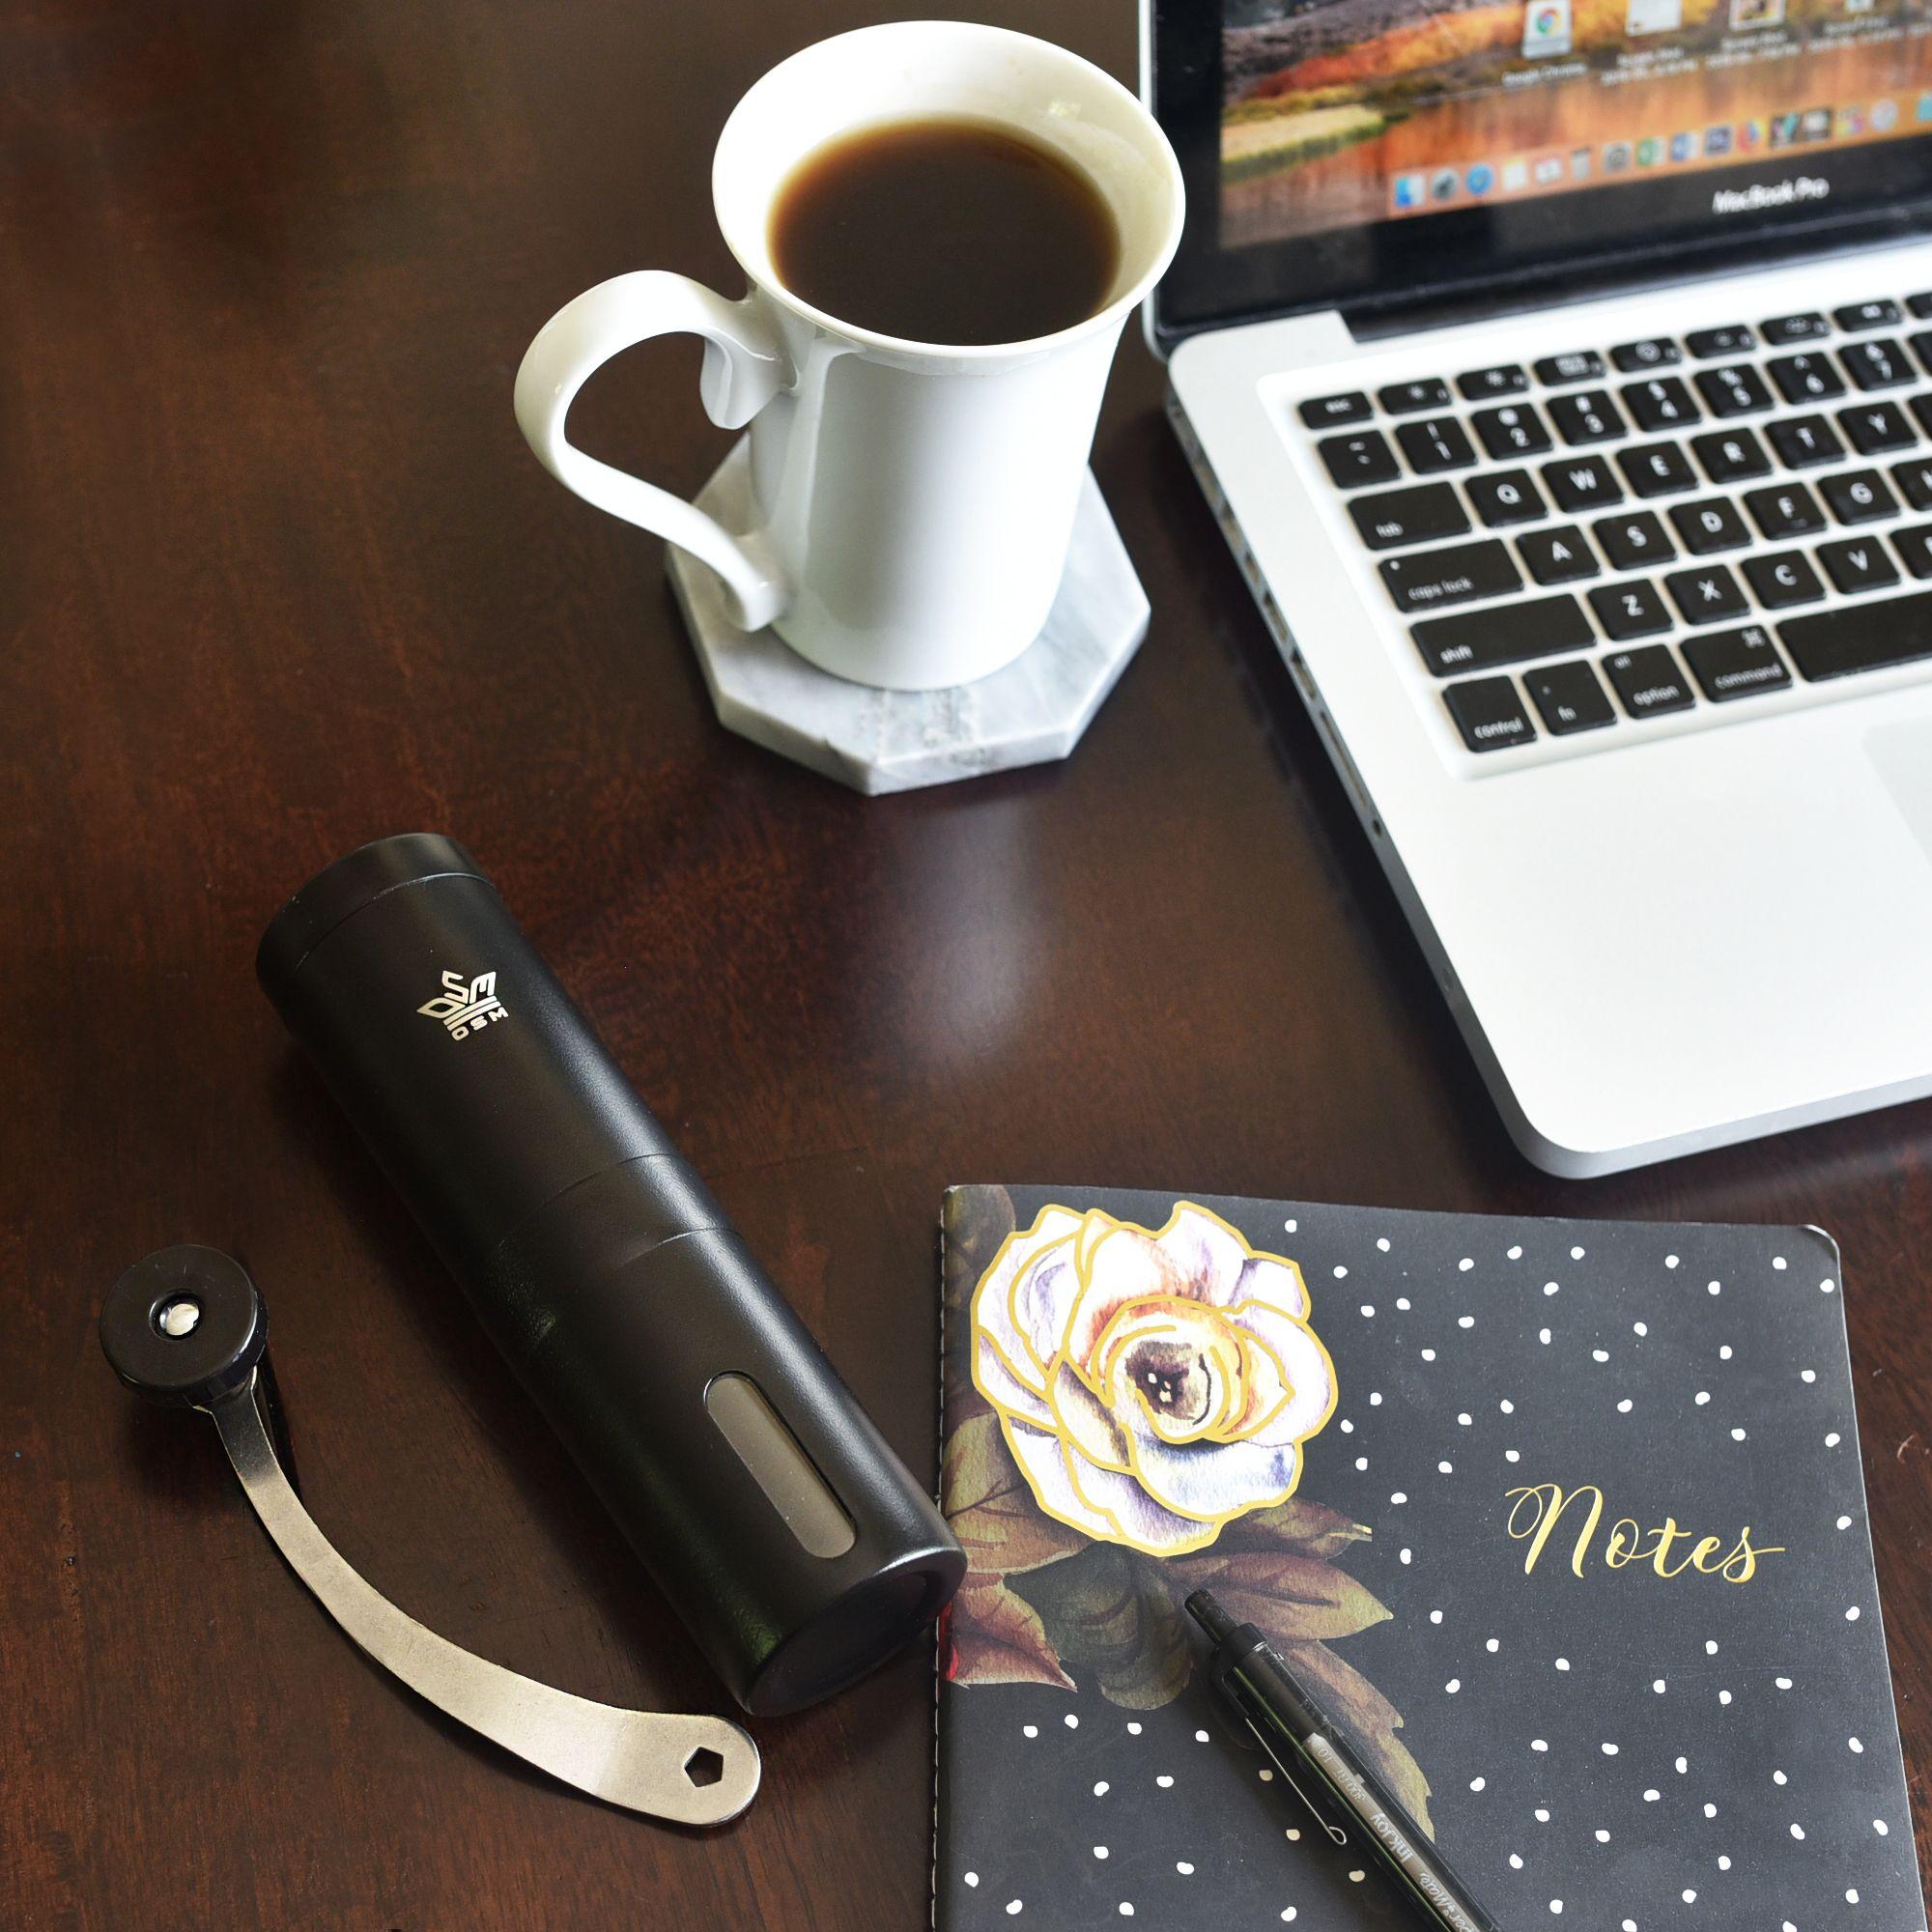 Stylish Black Hand Coffee Grinder! Manual coffee grinder